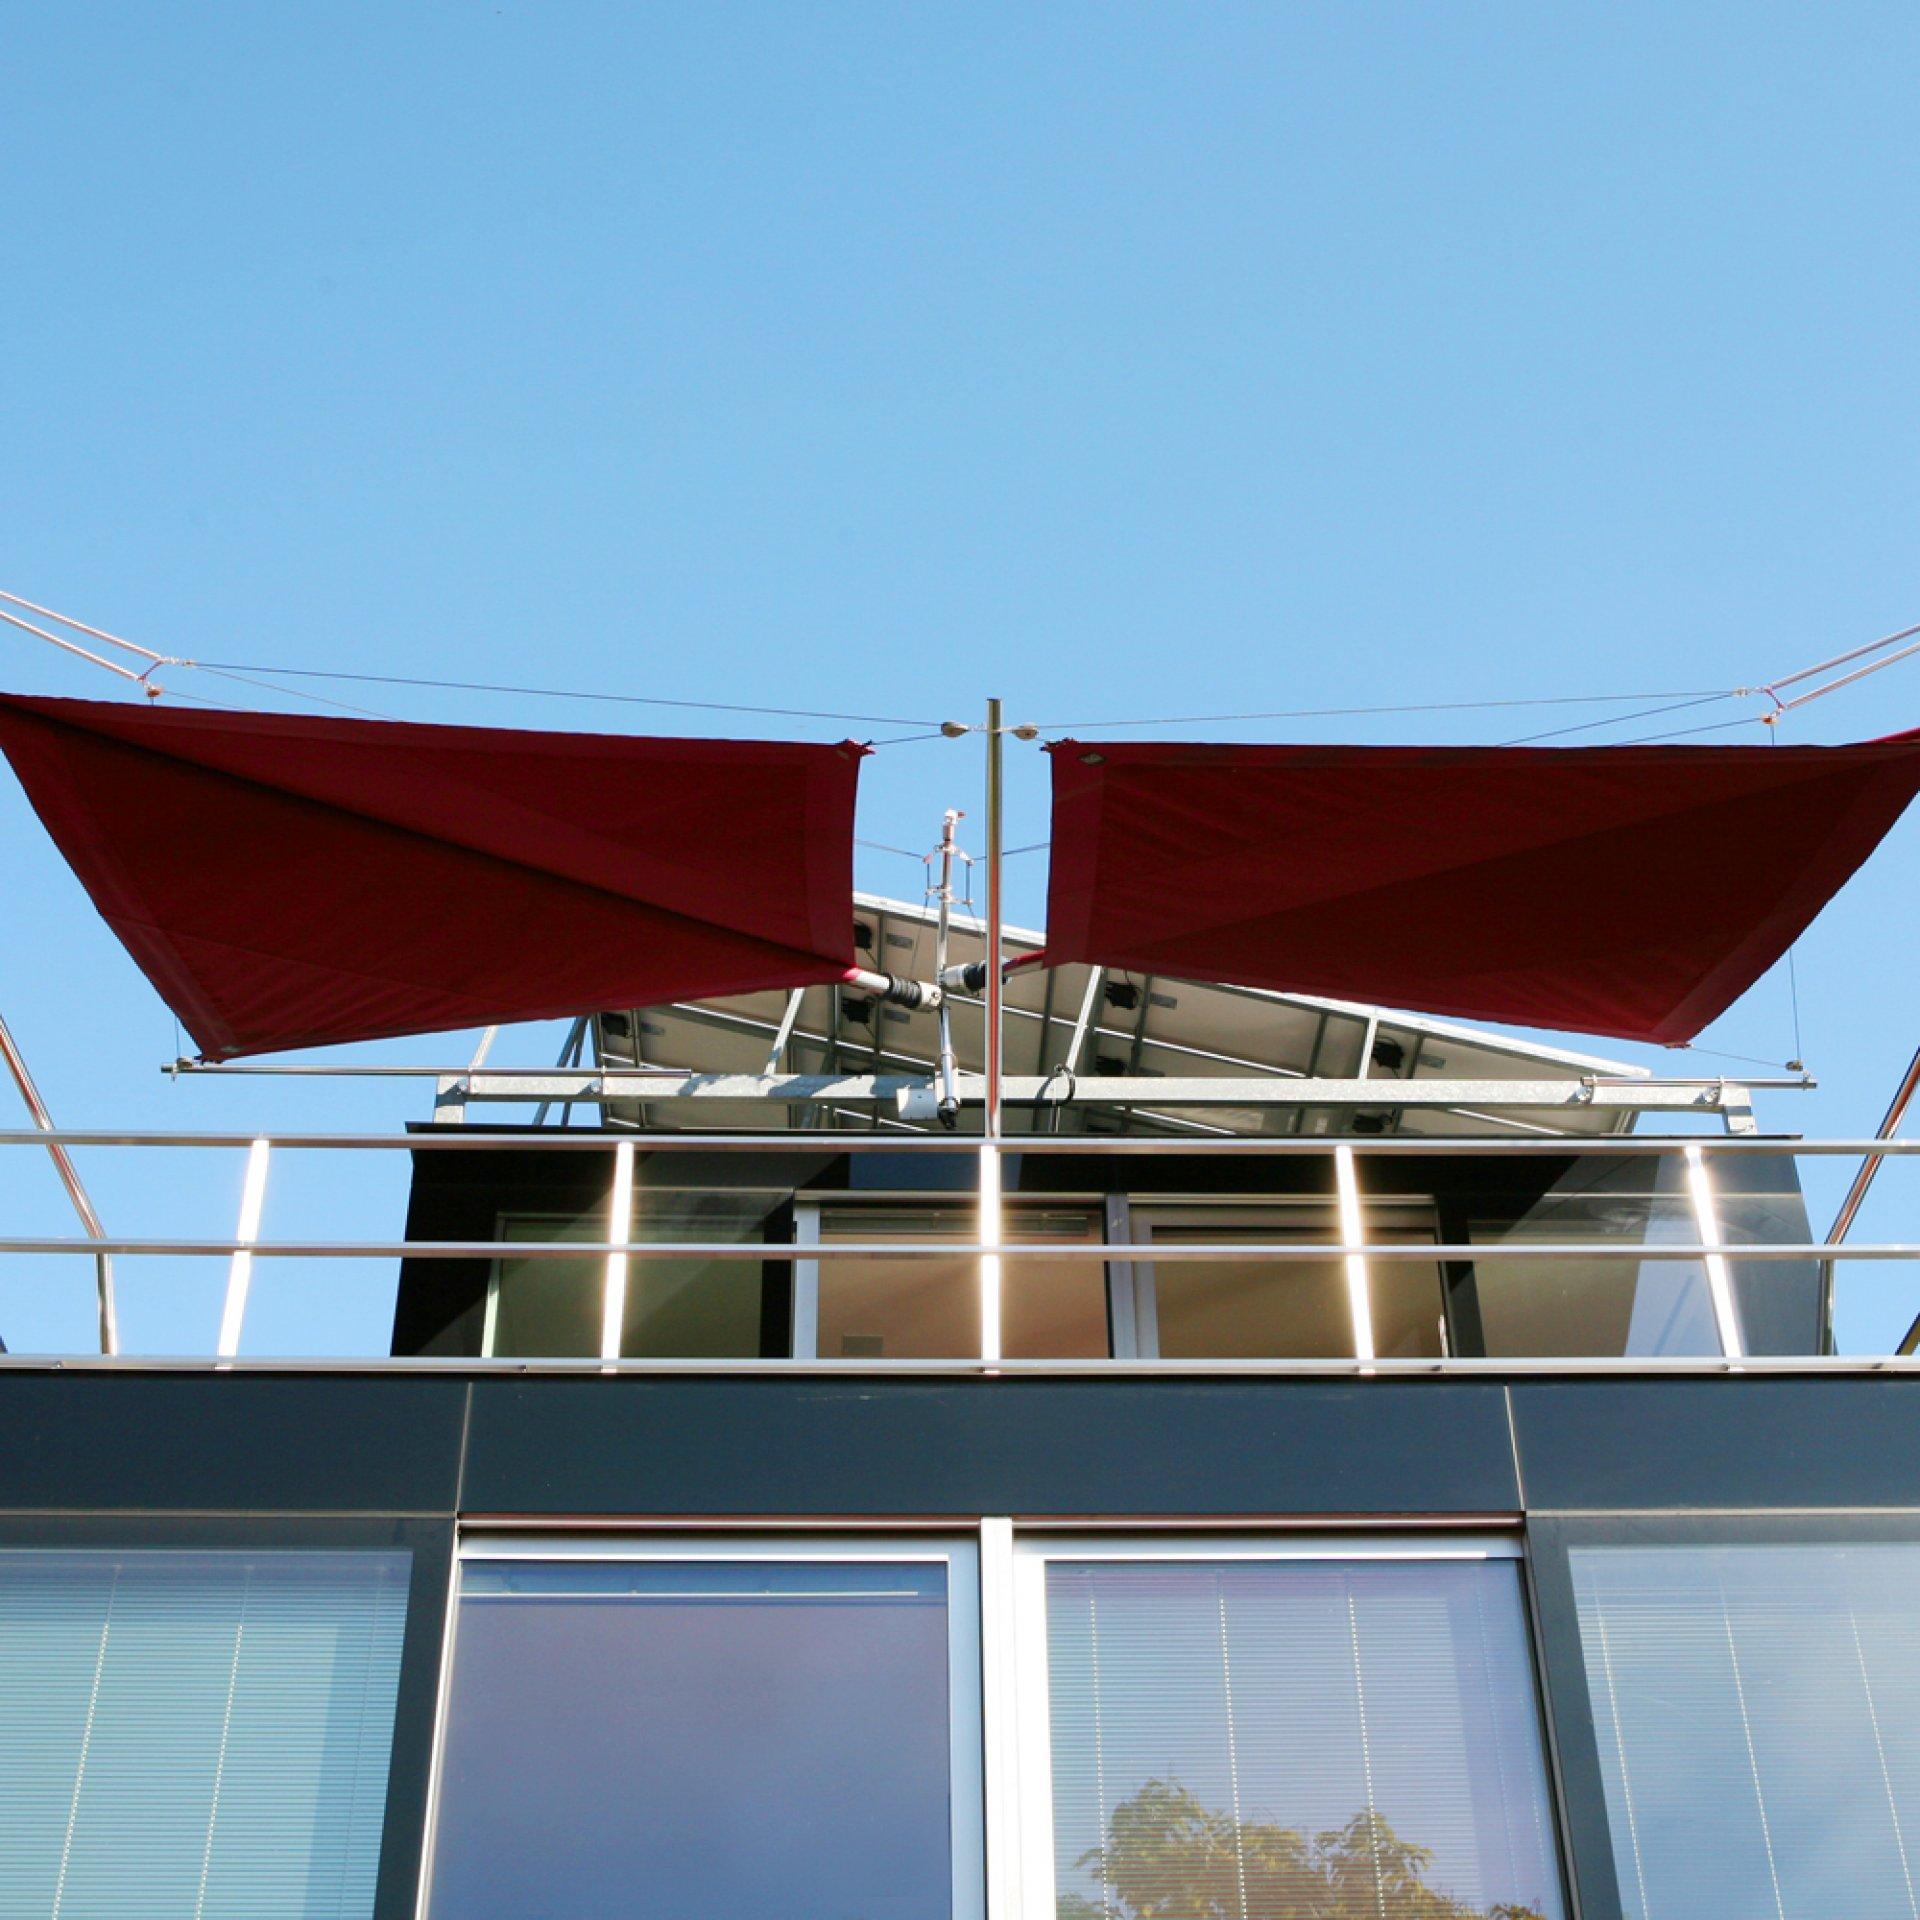 SunSquare - sun sail systems according to individual needs.